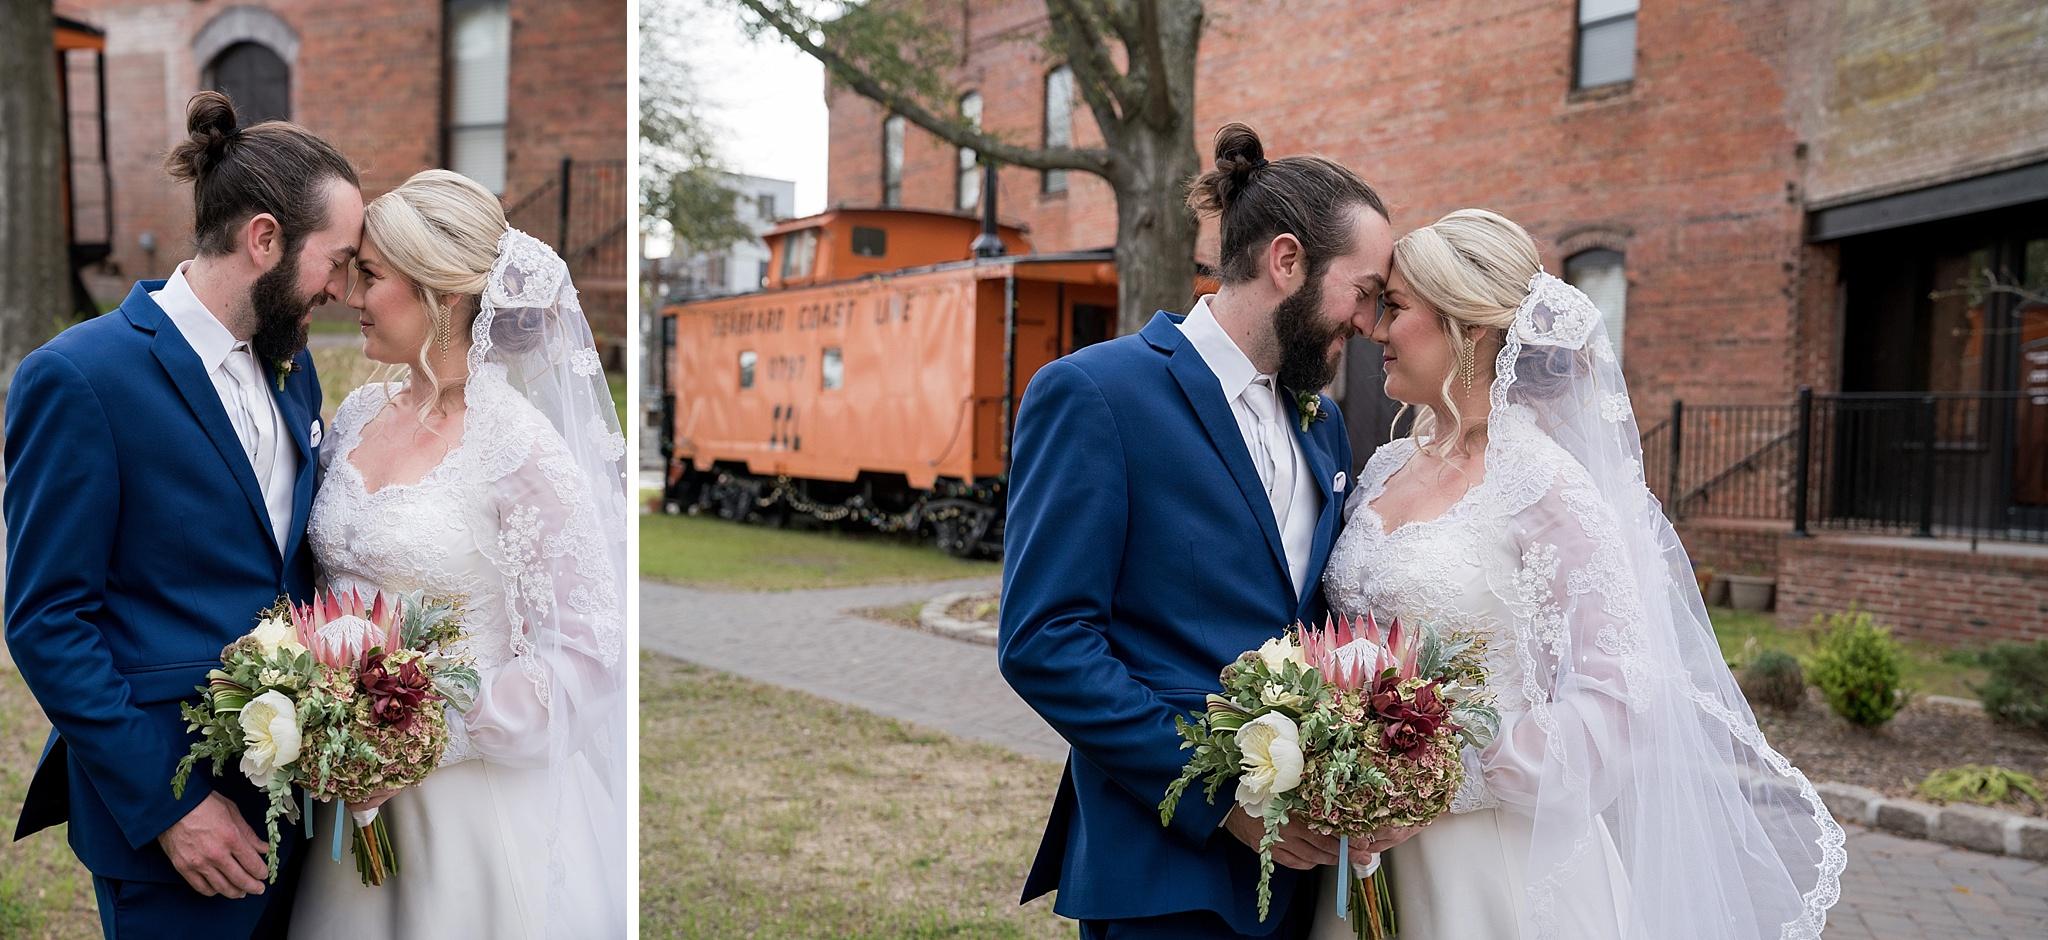 Washington-NC-Wedding-Photography-186.jpg